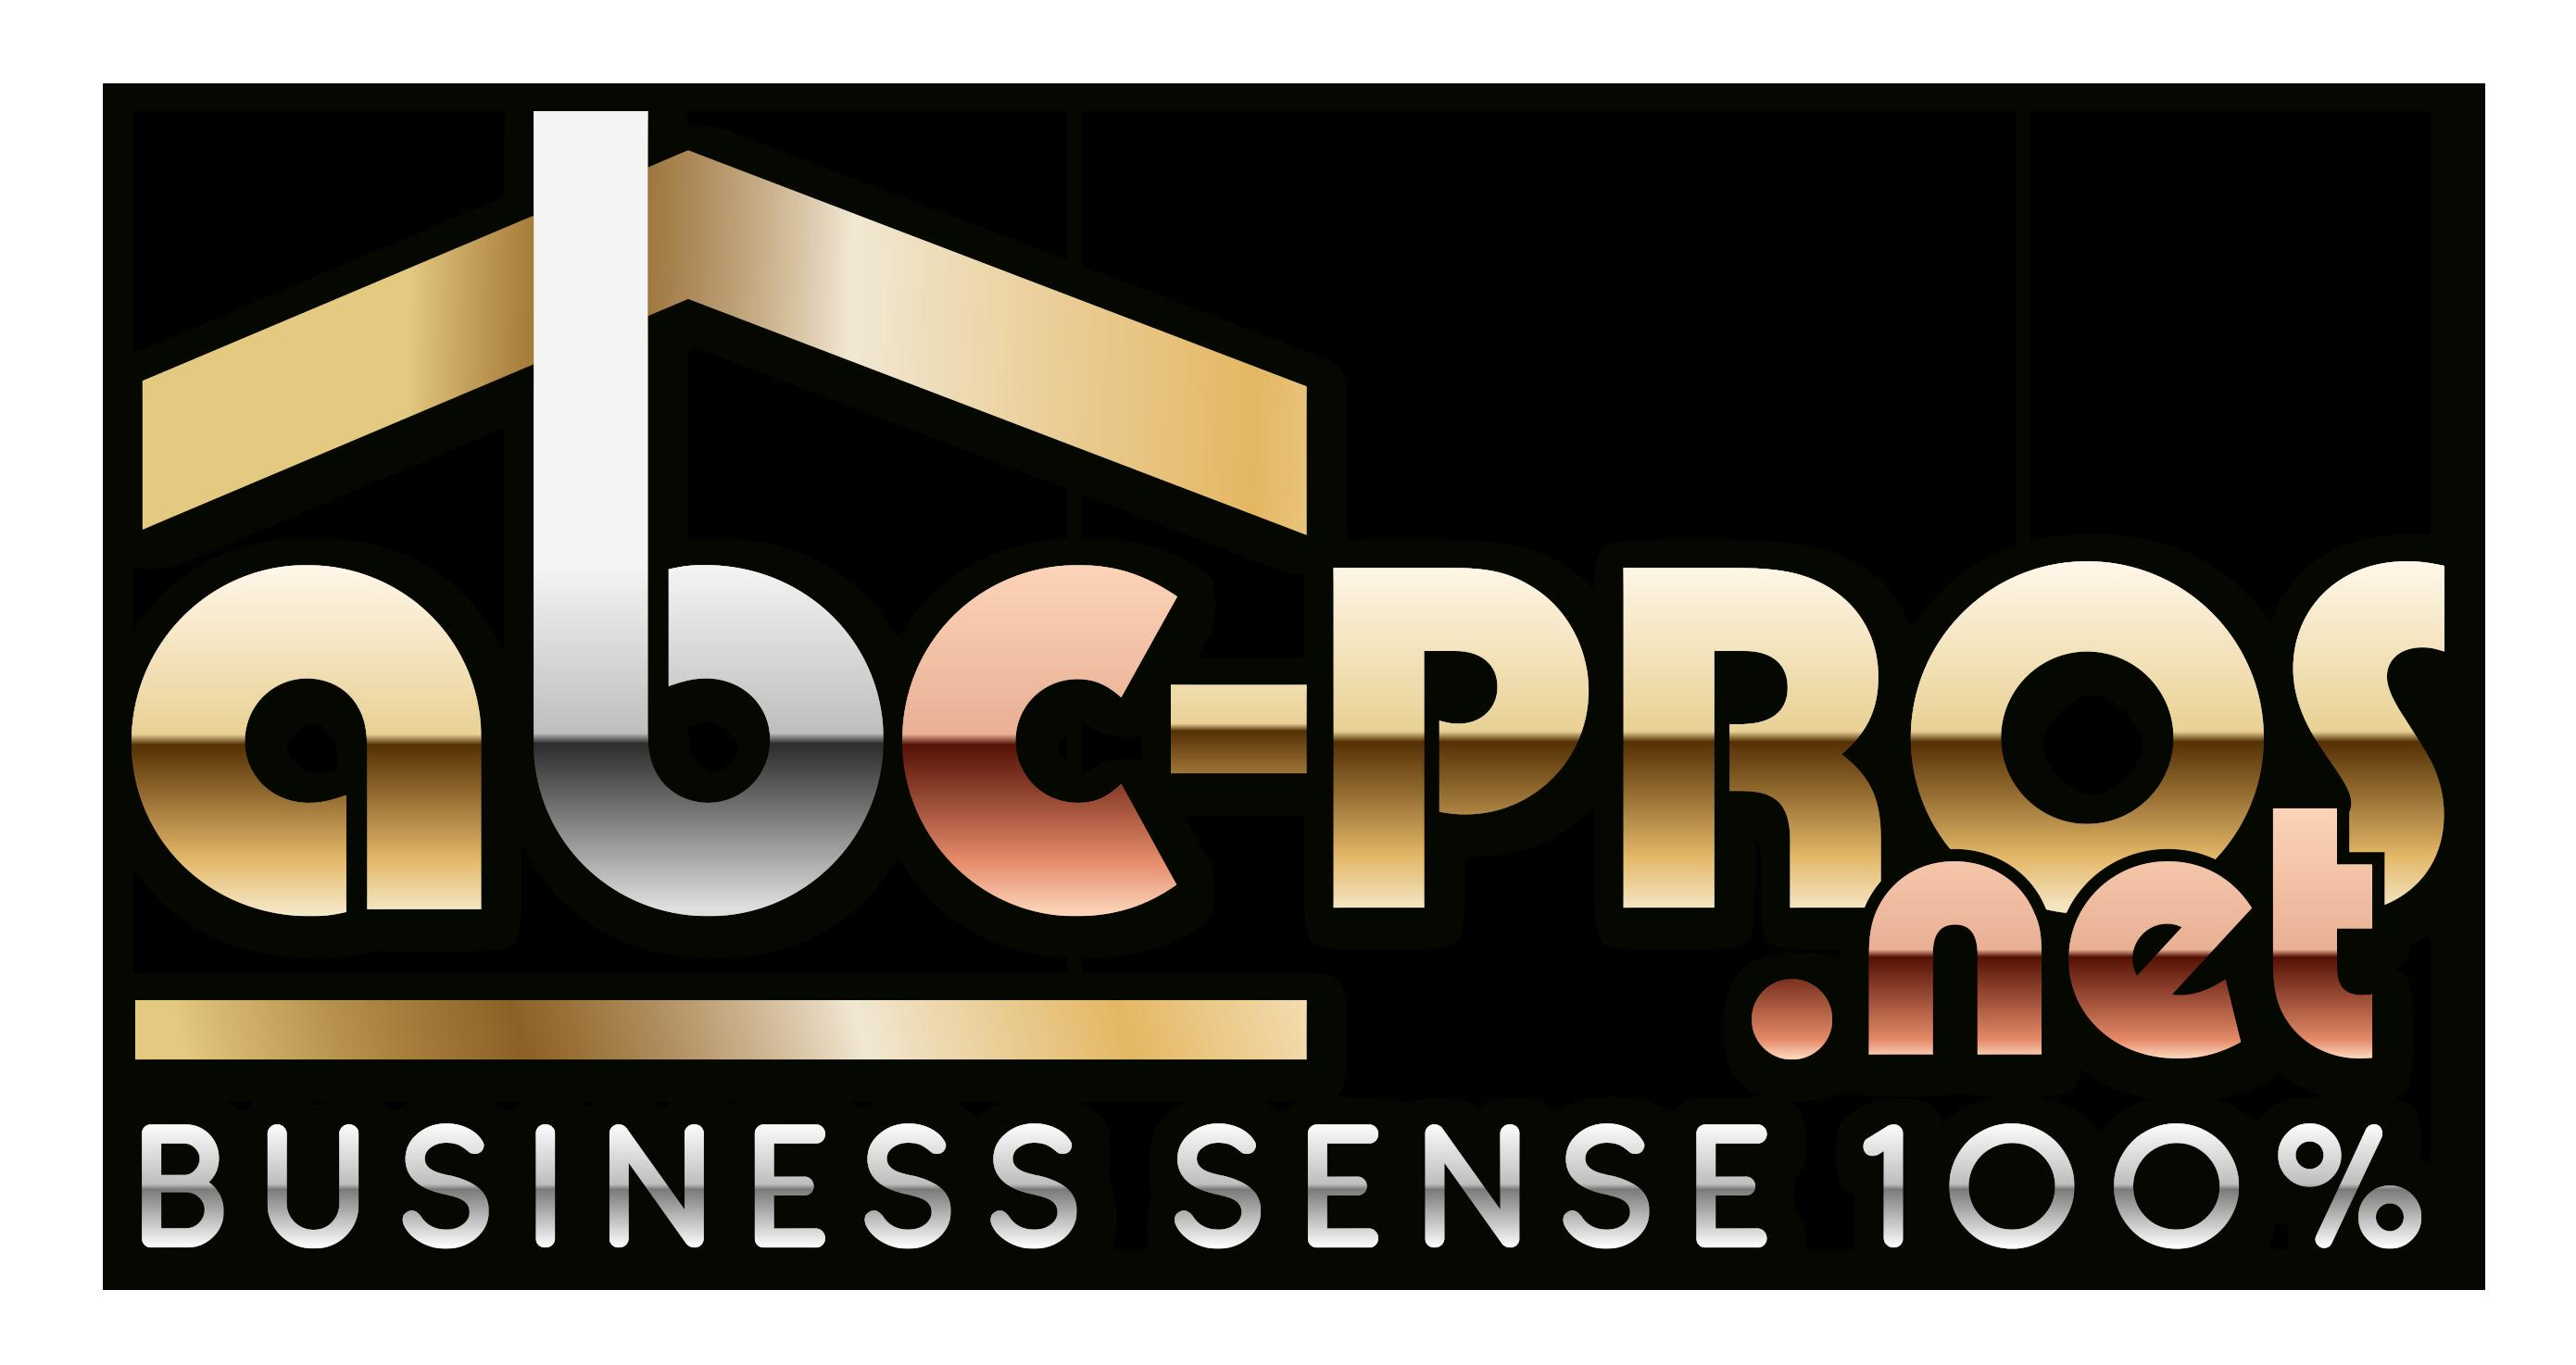 ABC PROFESSIONAL NETWORK LLC